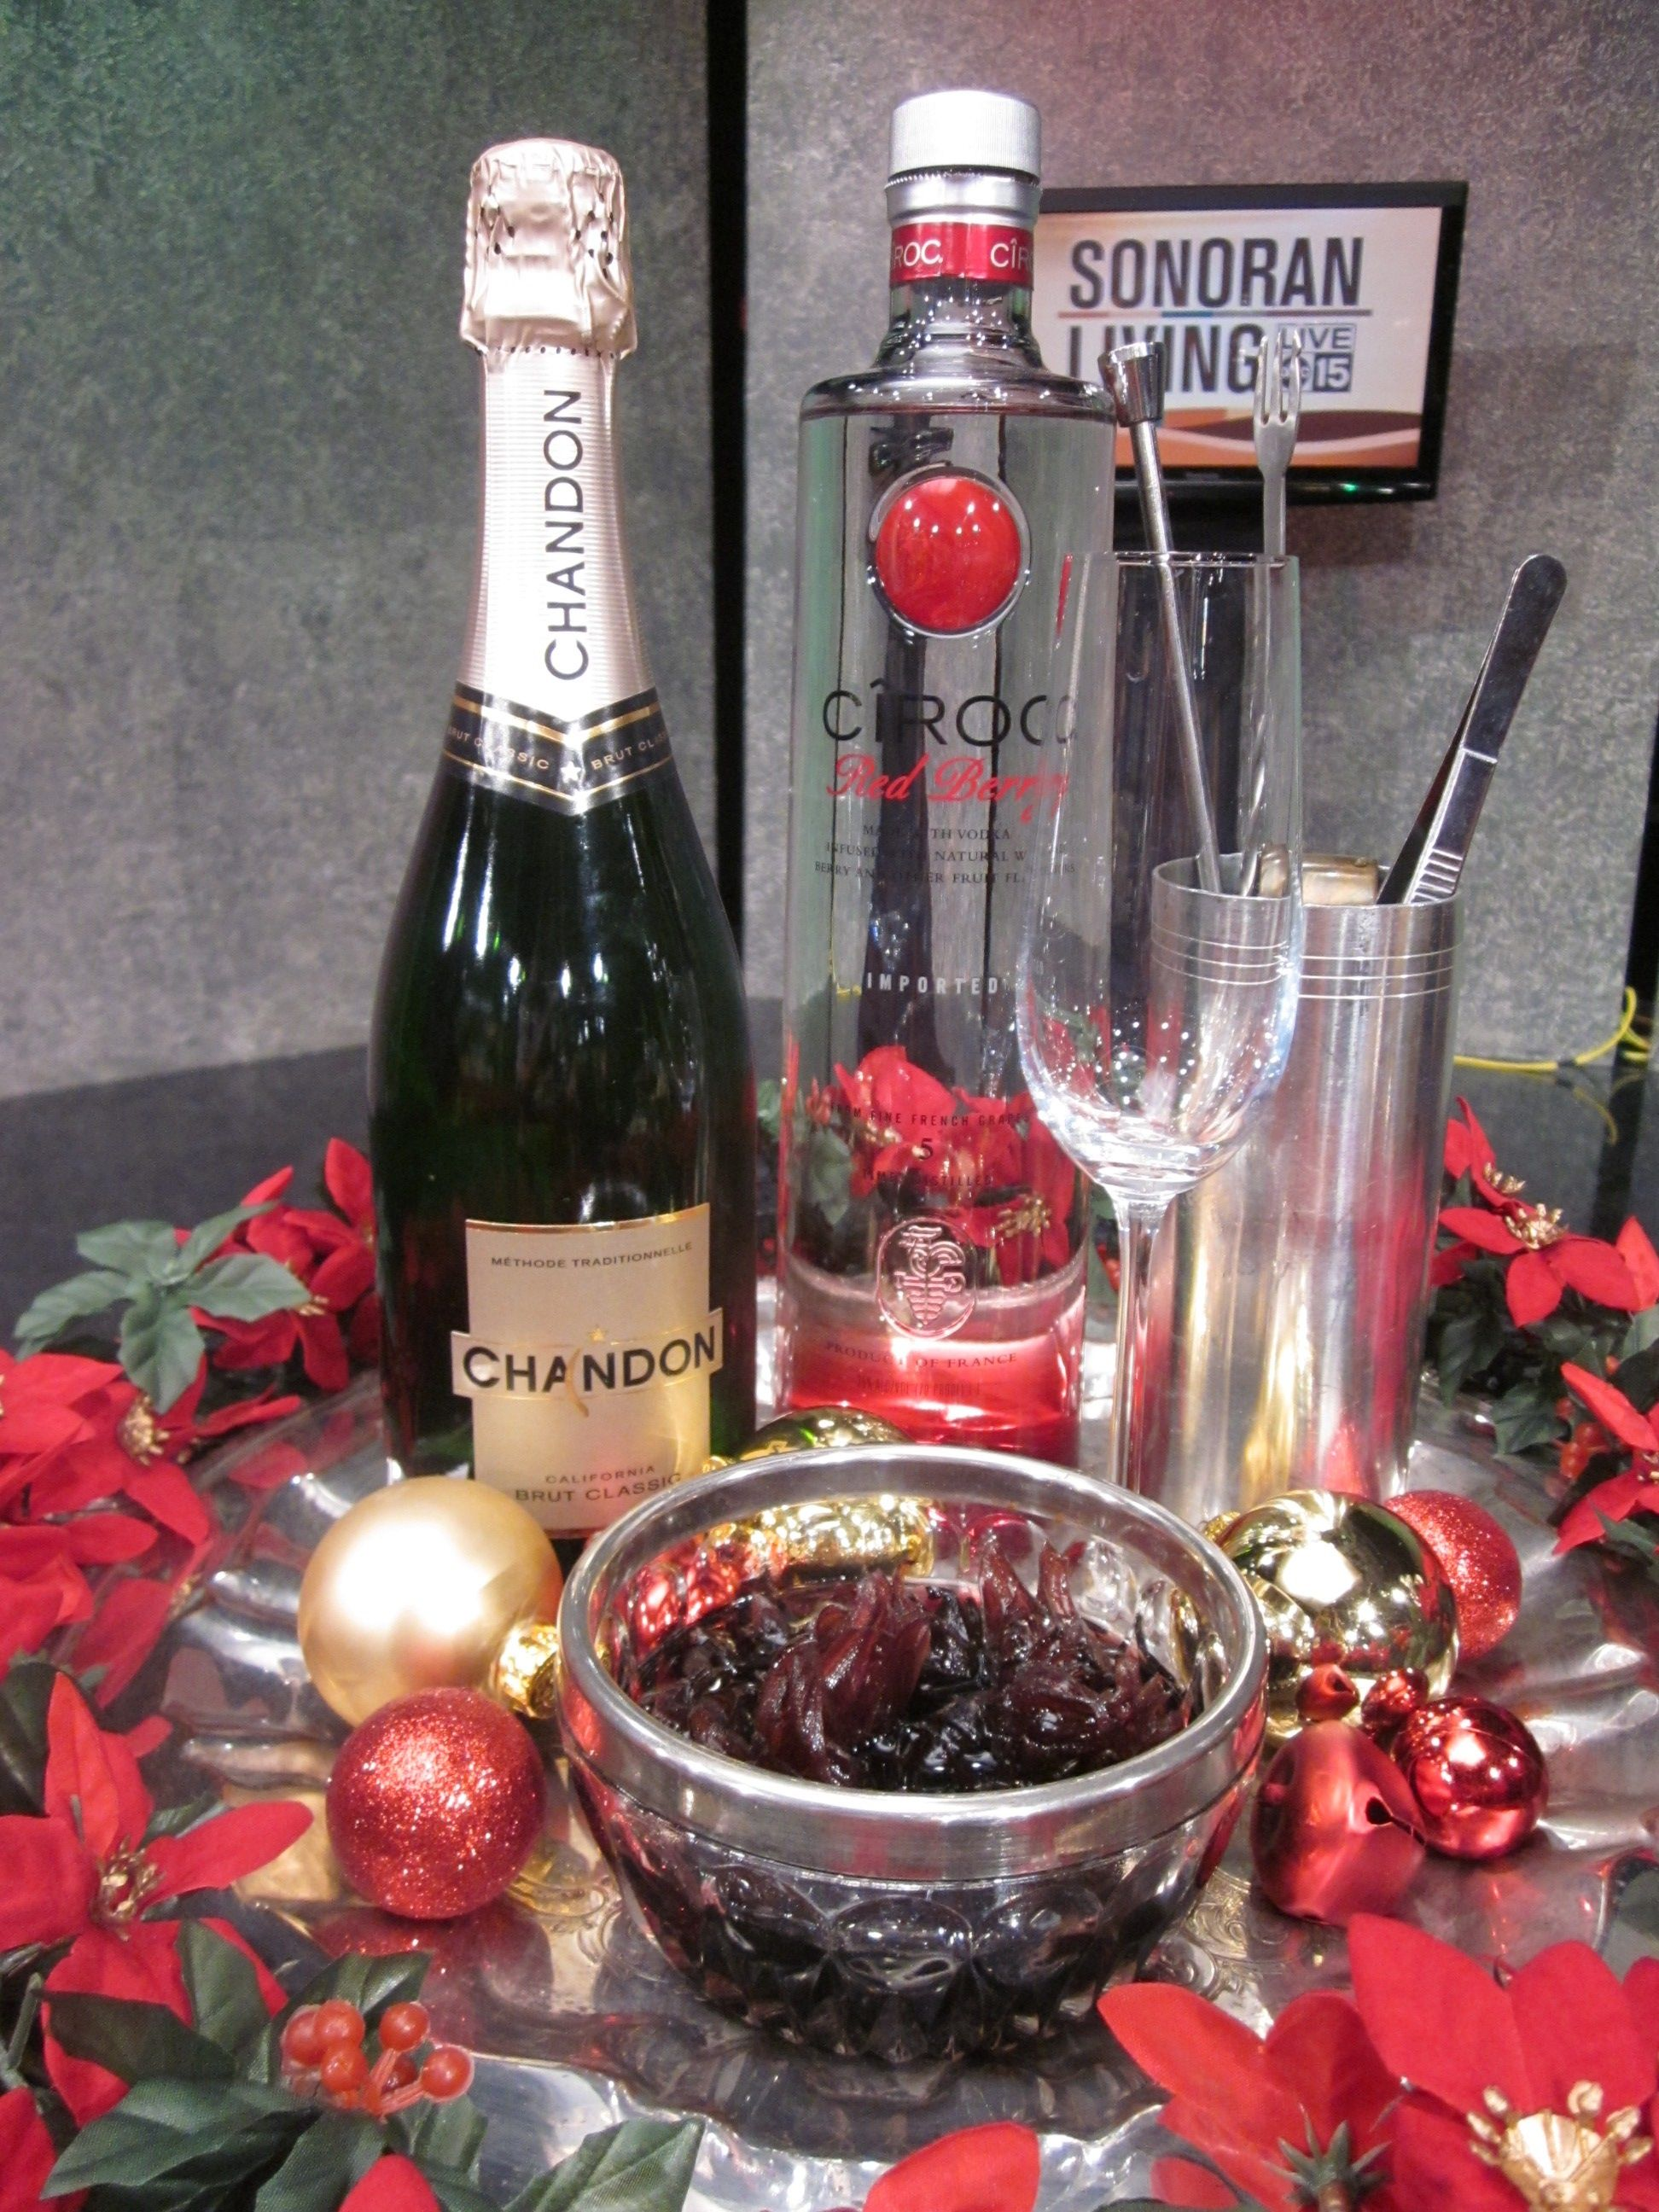 Hibiscus cooler 1 oz ciroc red berry chandon sparkling 1 tsp wild hibiscus cooler 1 oz ciroc red berry chandon sparkling 1 tsp wild hibiscus syrup place hibiscus flower at bottom of glass for garnish izmirmasajfo